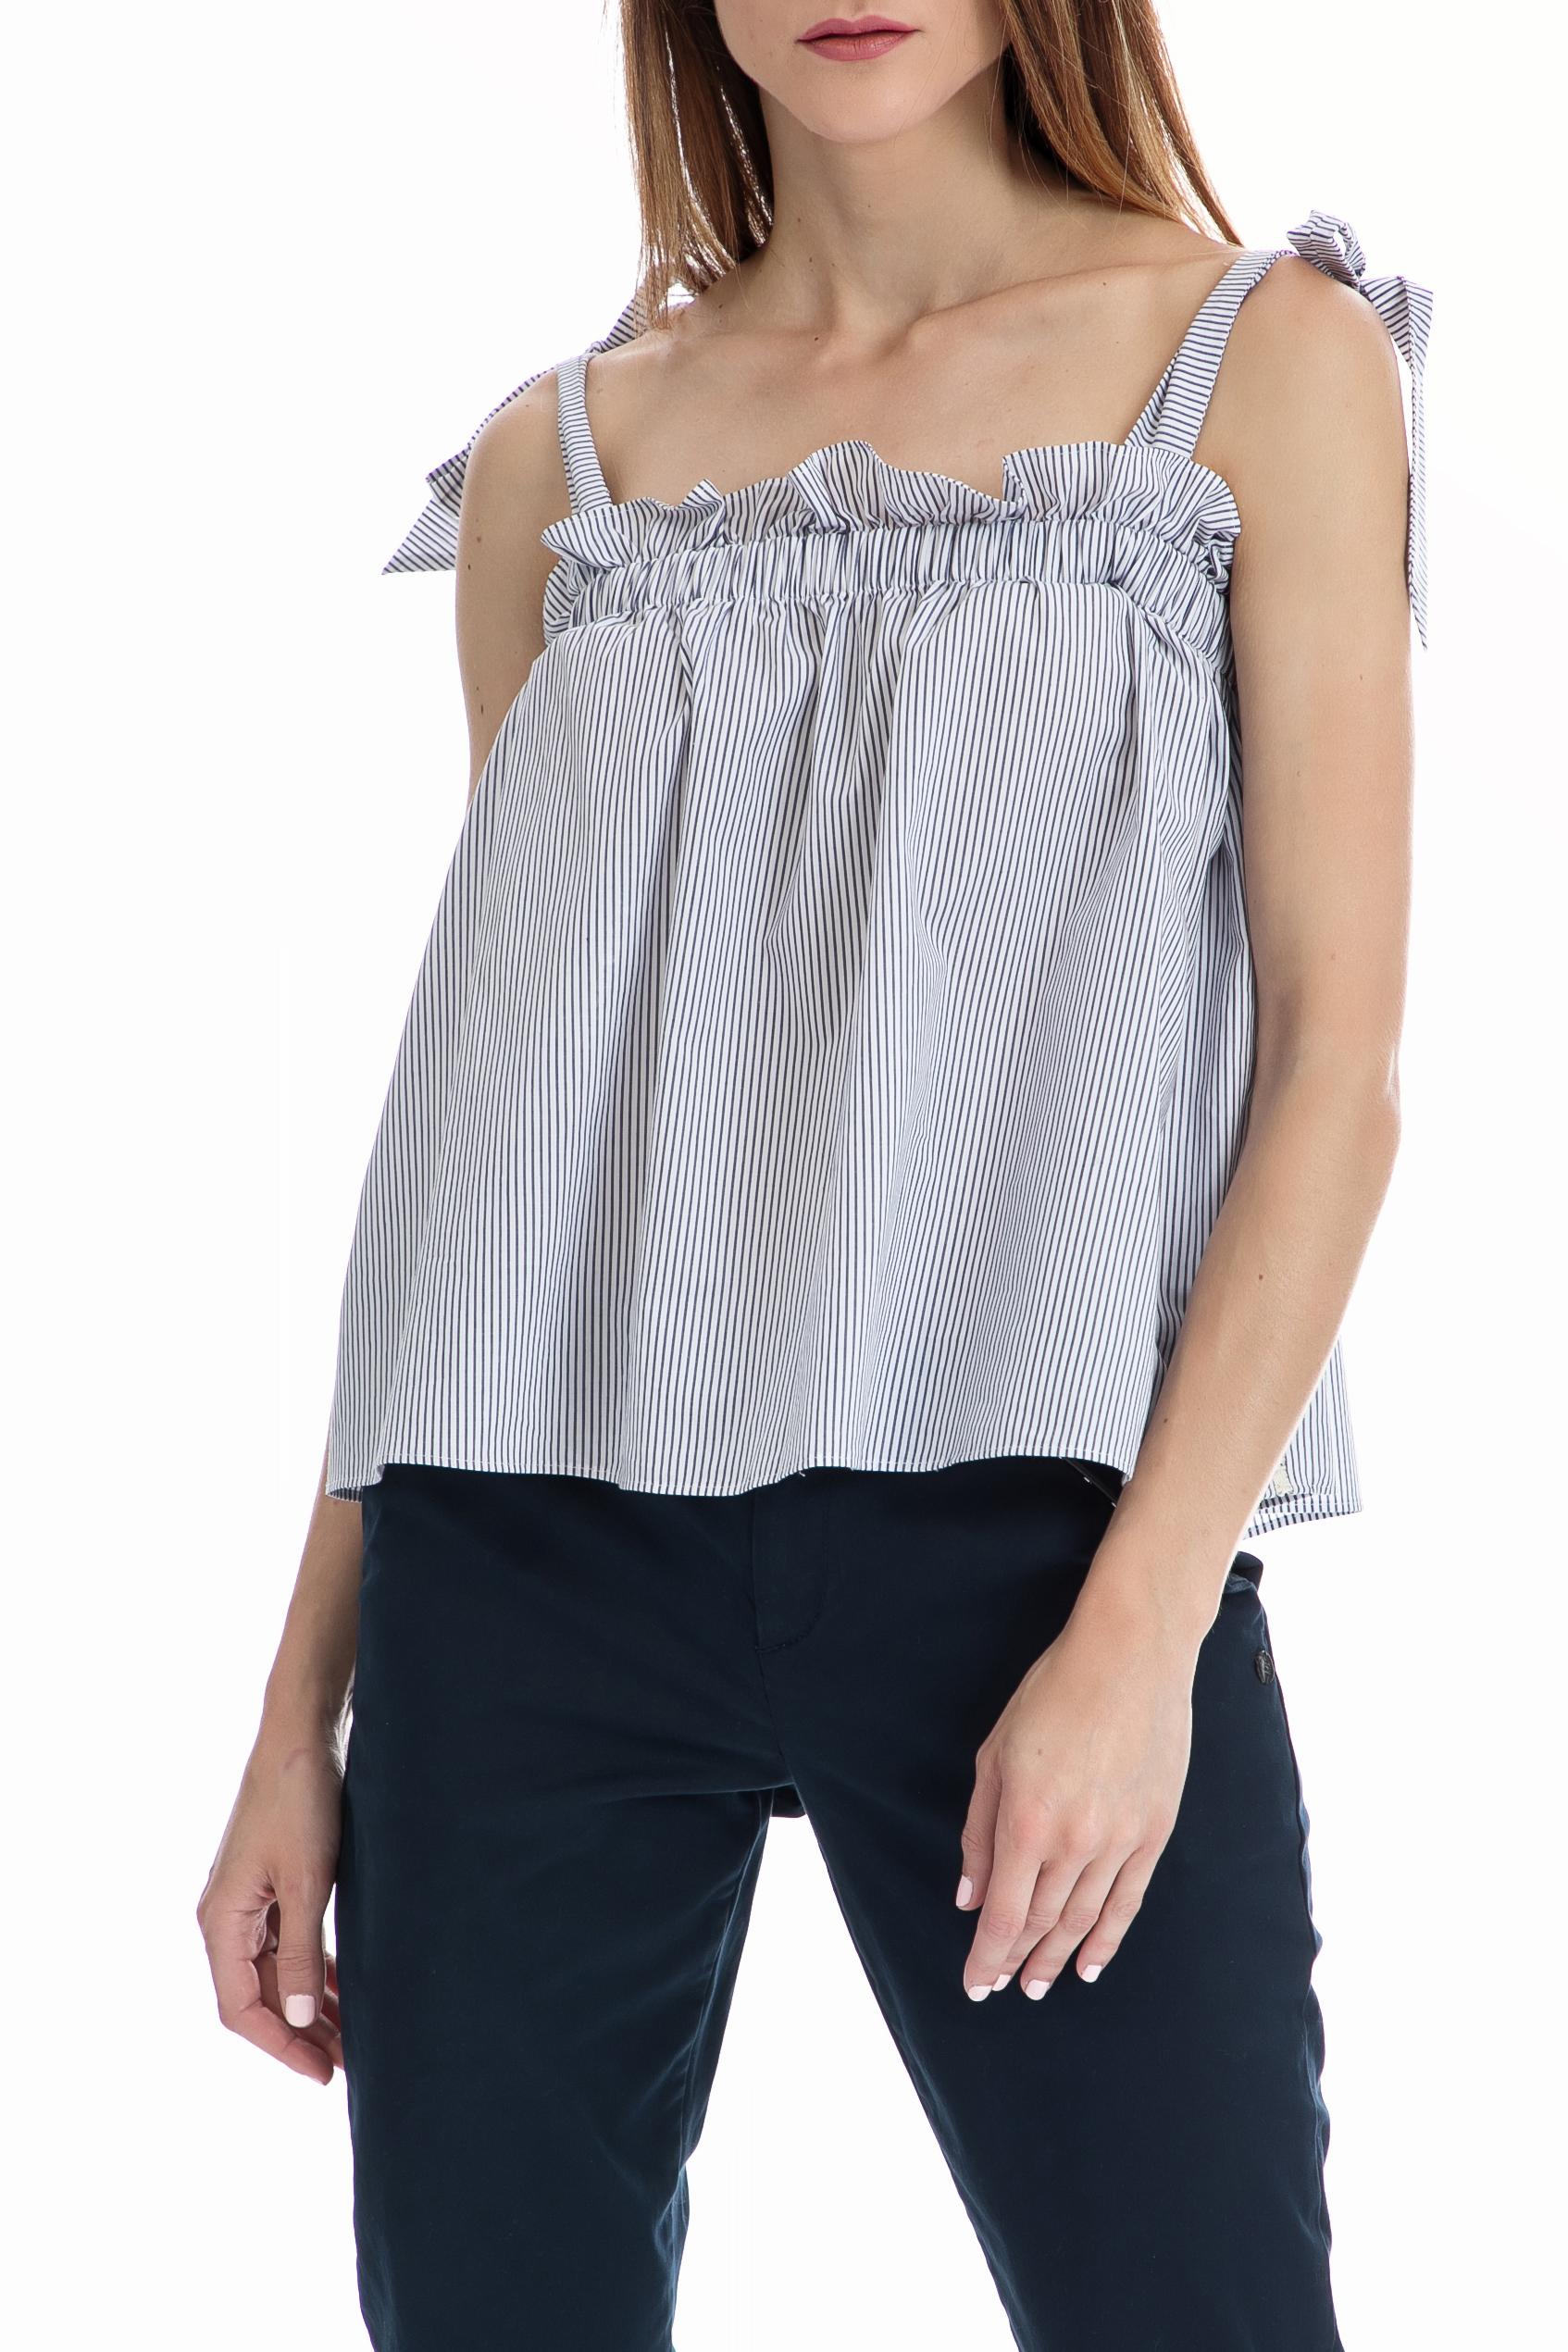 SCOTCH & SODA - Γυναικείο τοπ Cotton with ruffle SCOTCH & SODA μπλε-λευκό